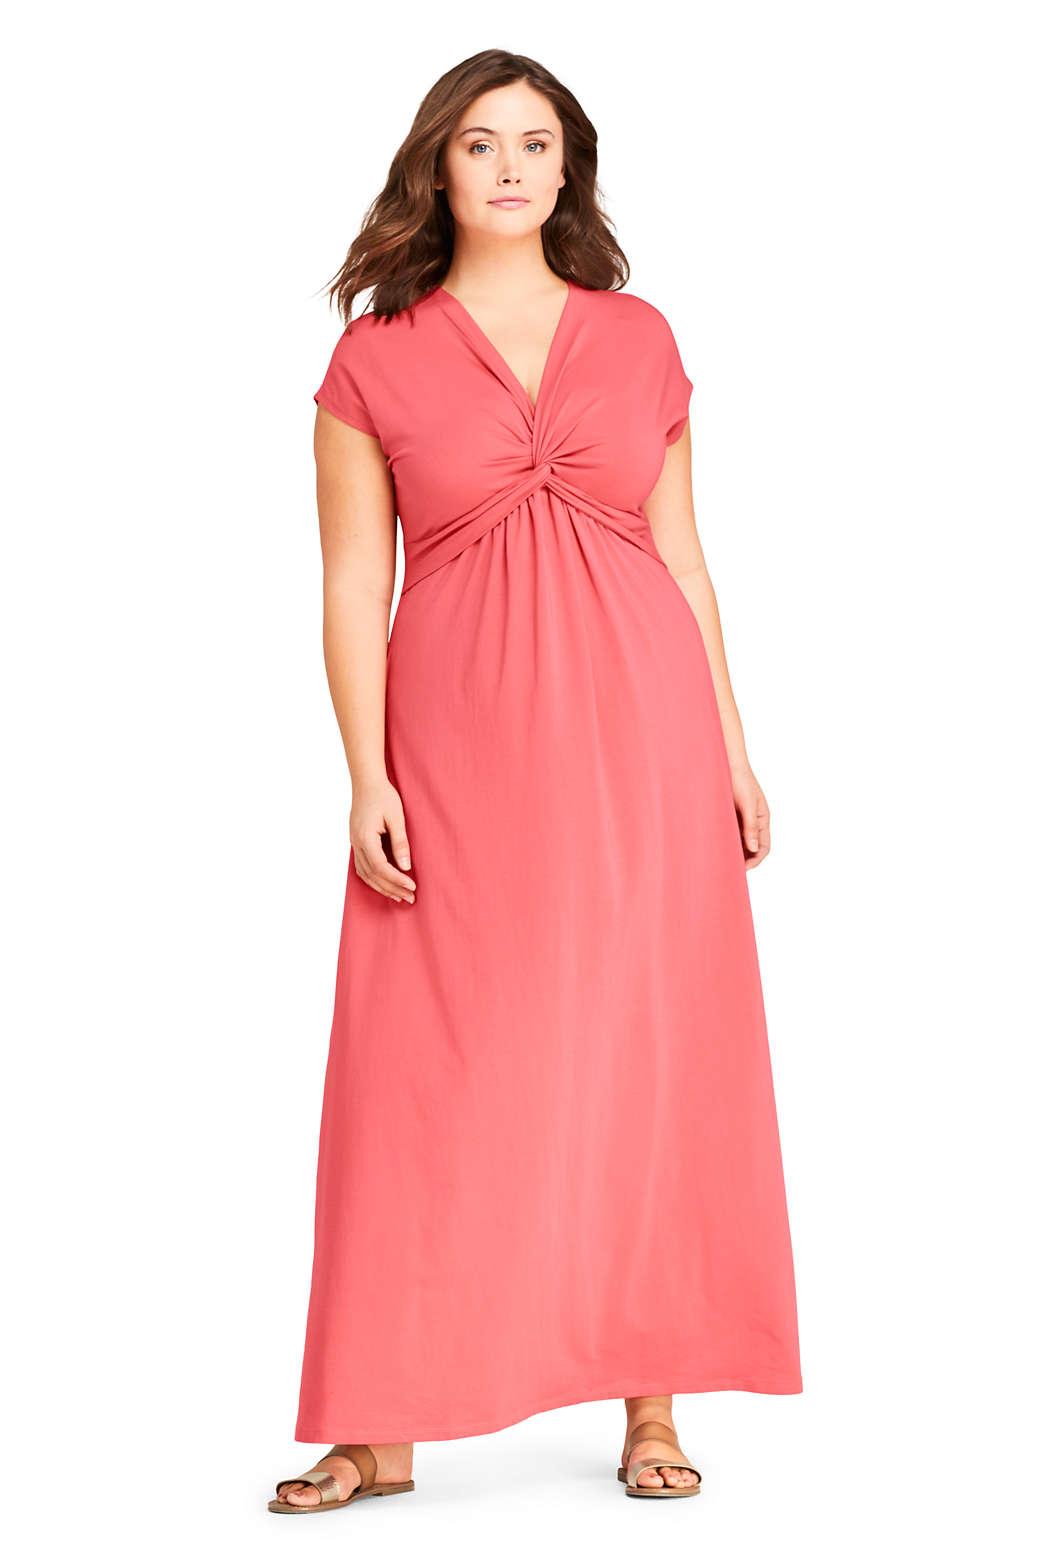 40cf879d74 Women s Plus Size Cap Sleeve Knit Knot Front Maxi Dress from Lands  End